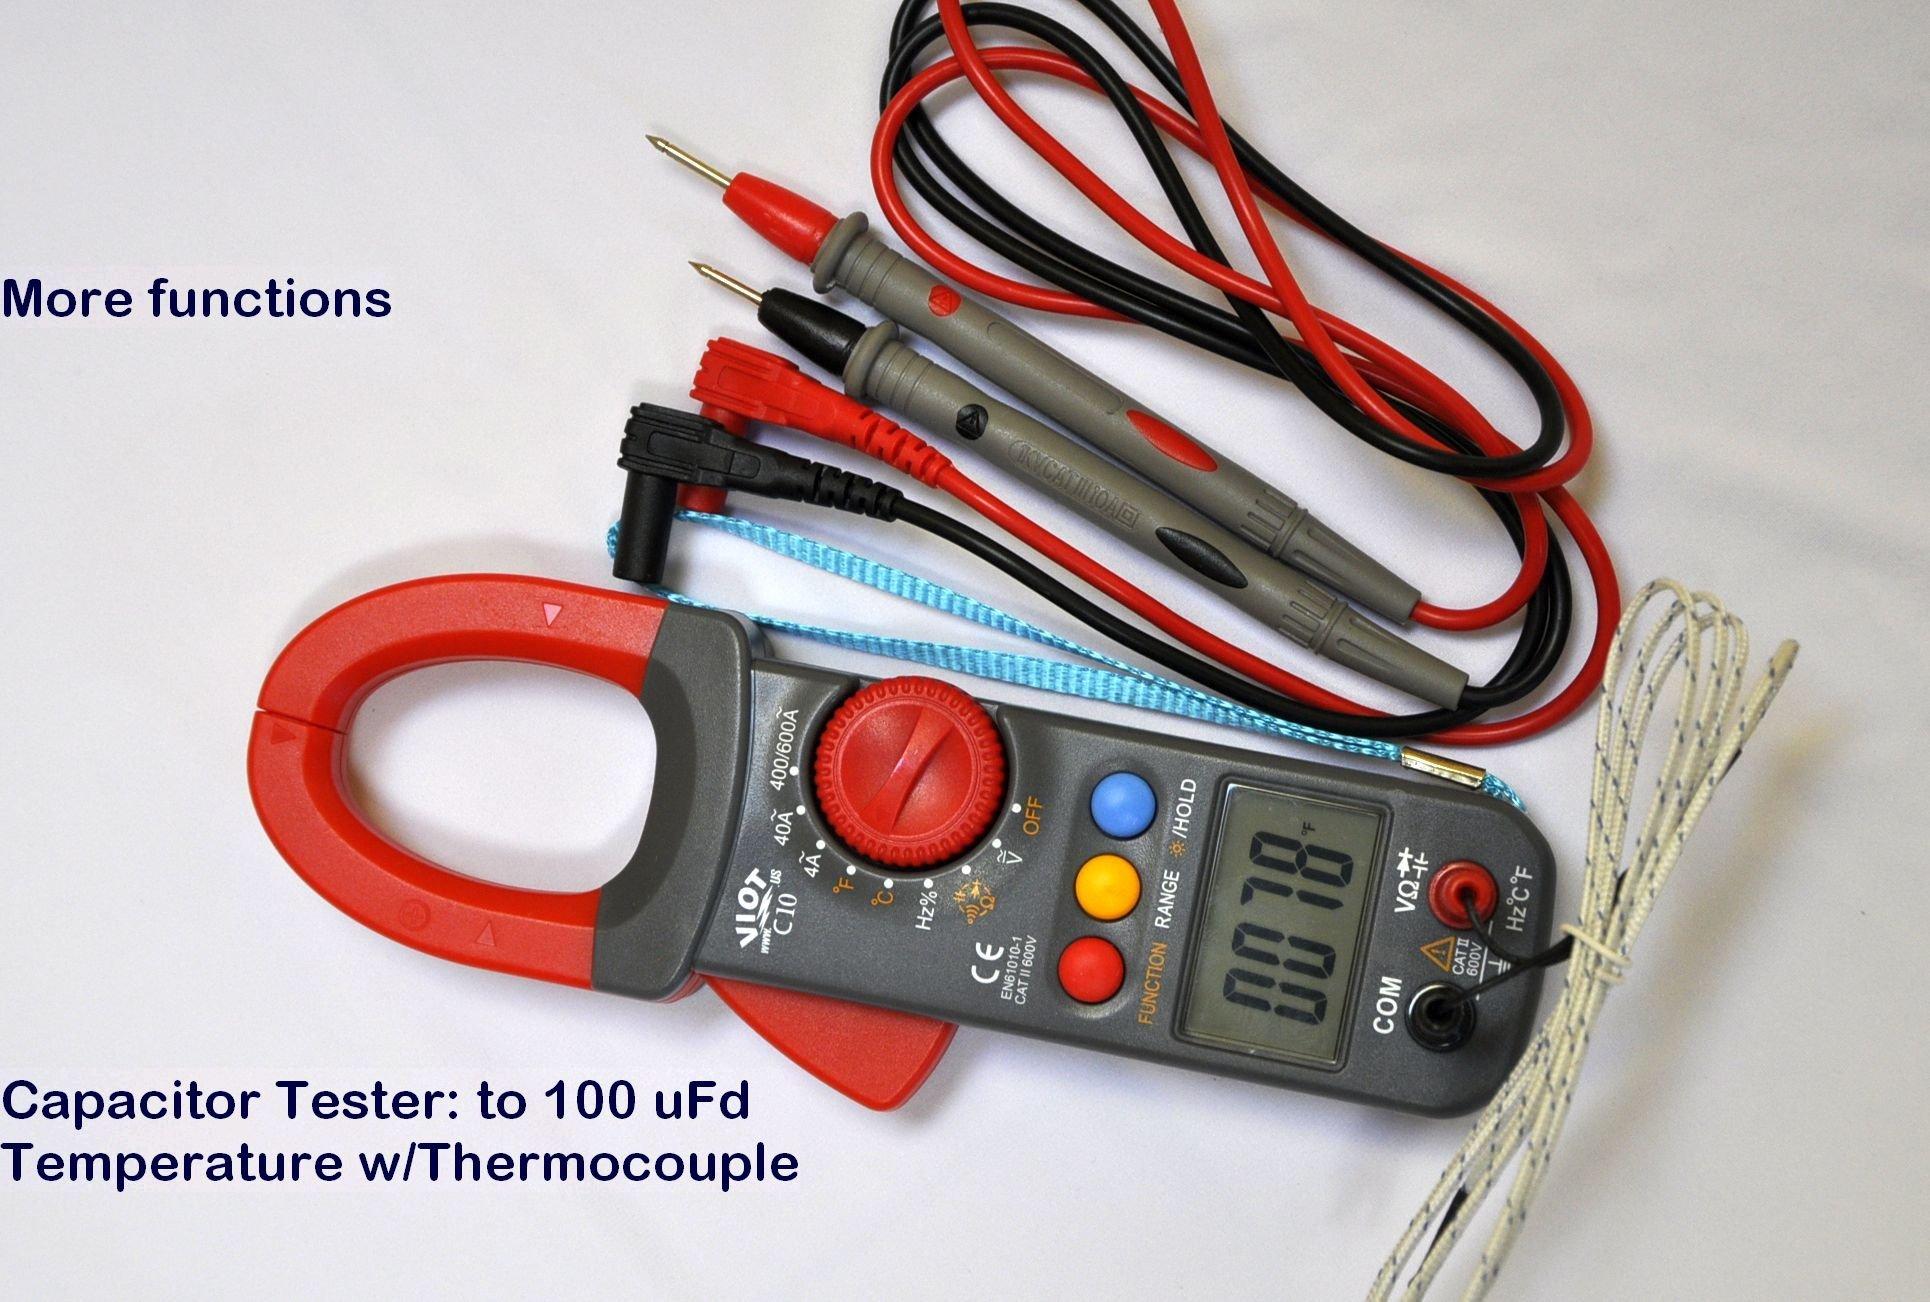 Digital Clamp Meter Ammeter Multimeter DMM+Capacitor Tester+Type K Thermocouple HVAC Electric Circuit Diagnosis Repair Service Tool